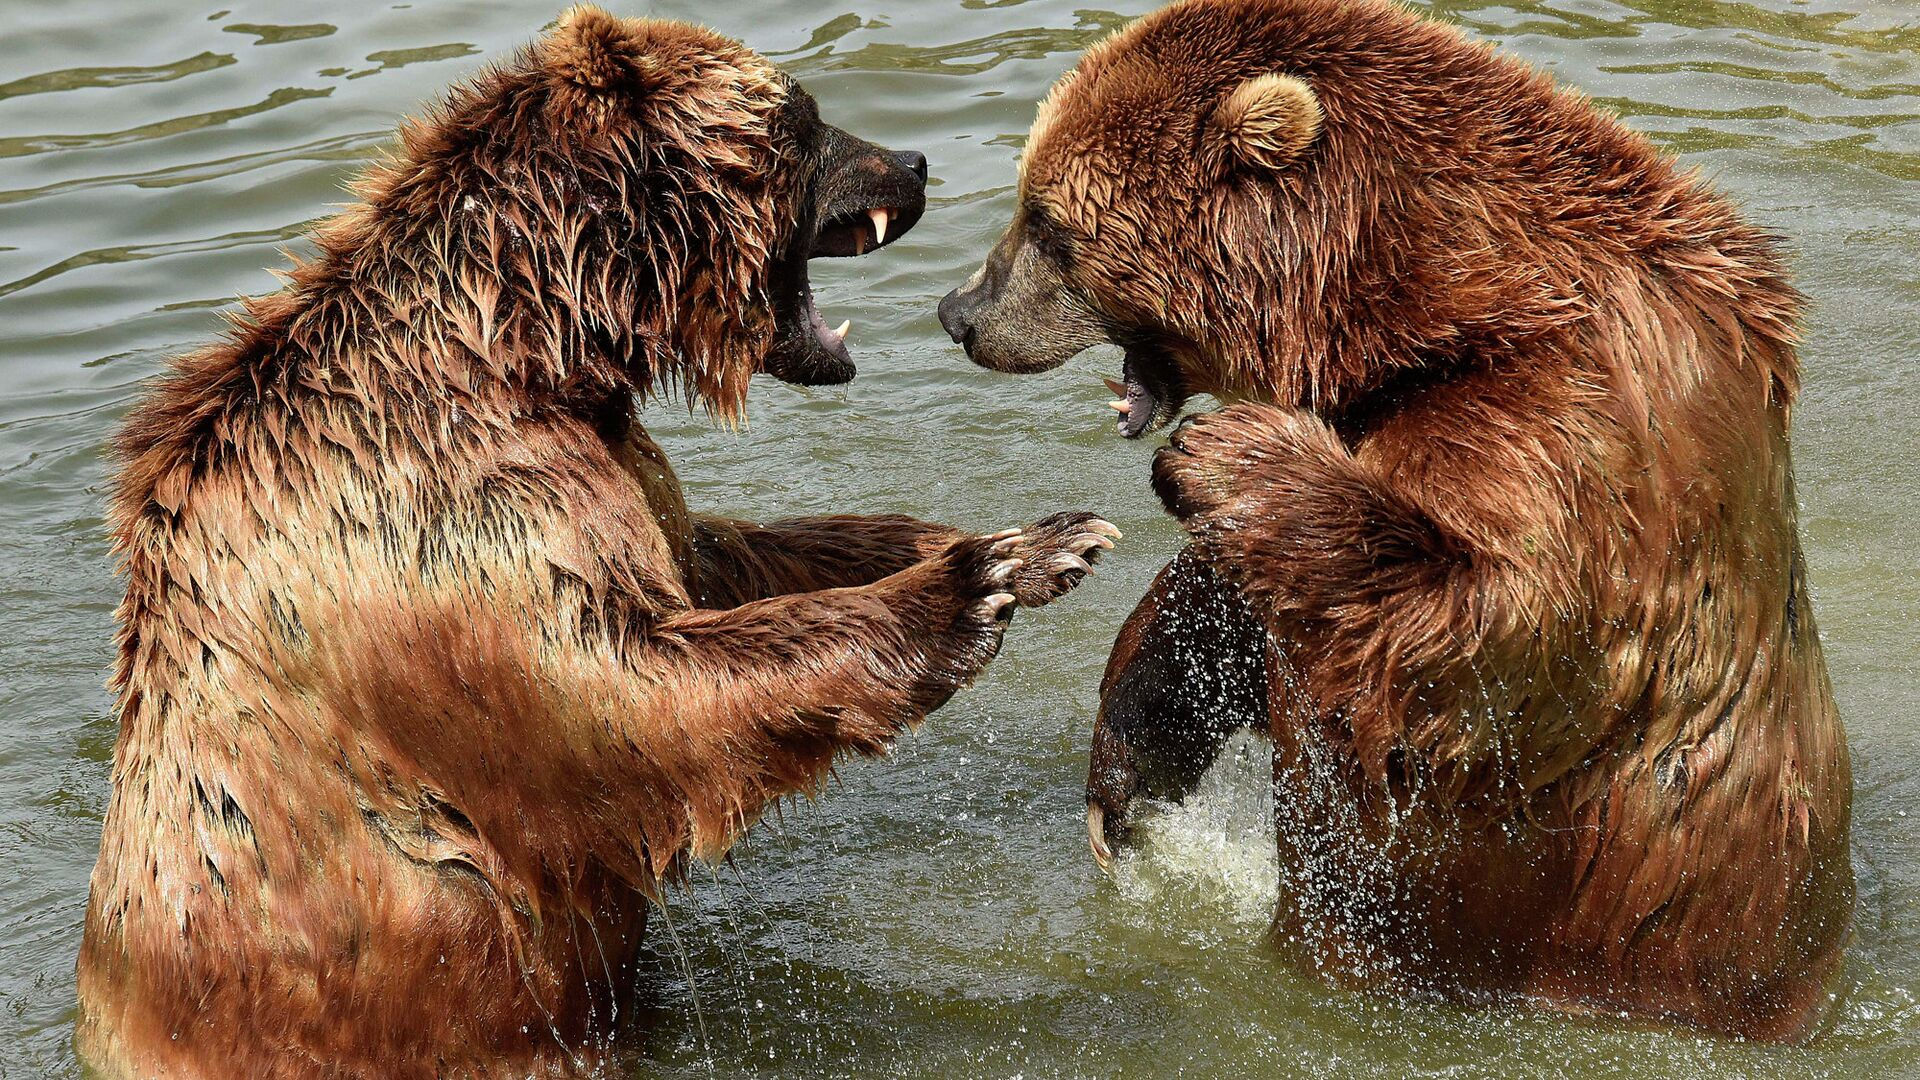 В Иркутской области полиция застрелила медведя на кладбище